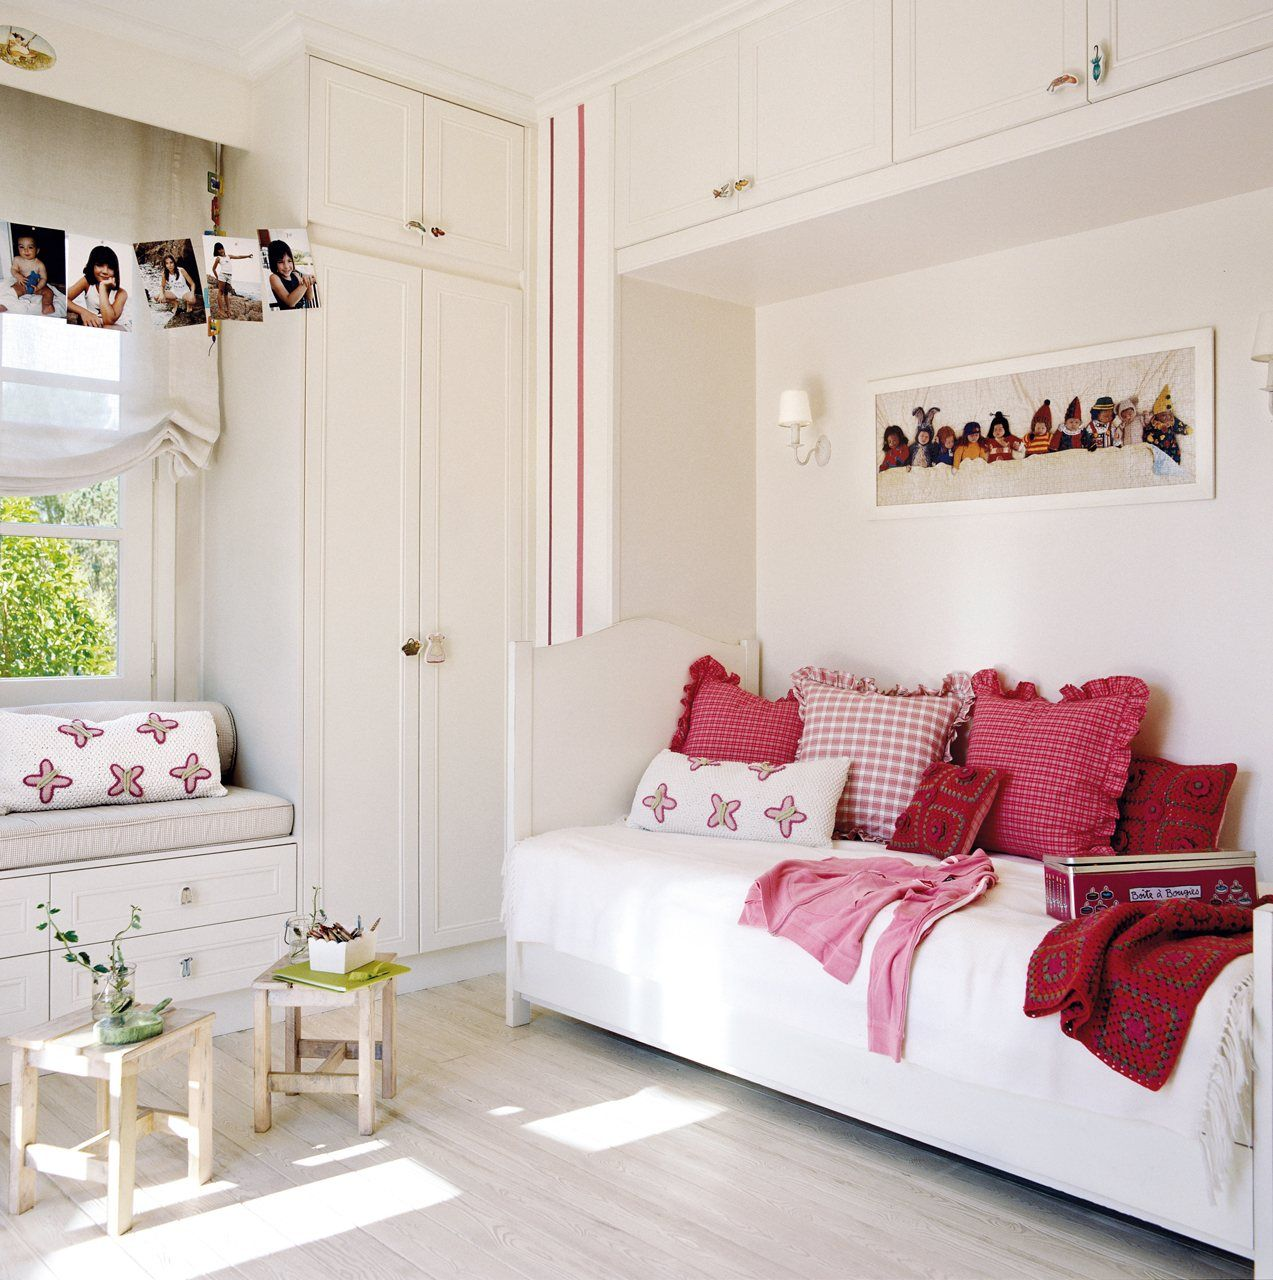 claves para decorar la habitacin infantil elmueblecom nios